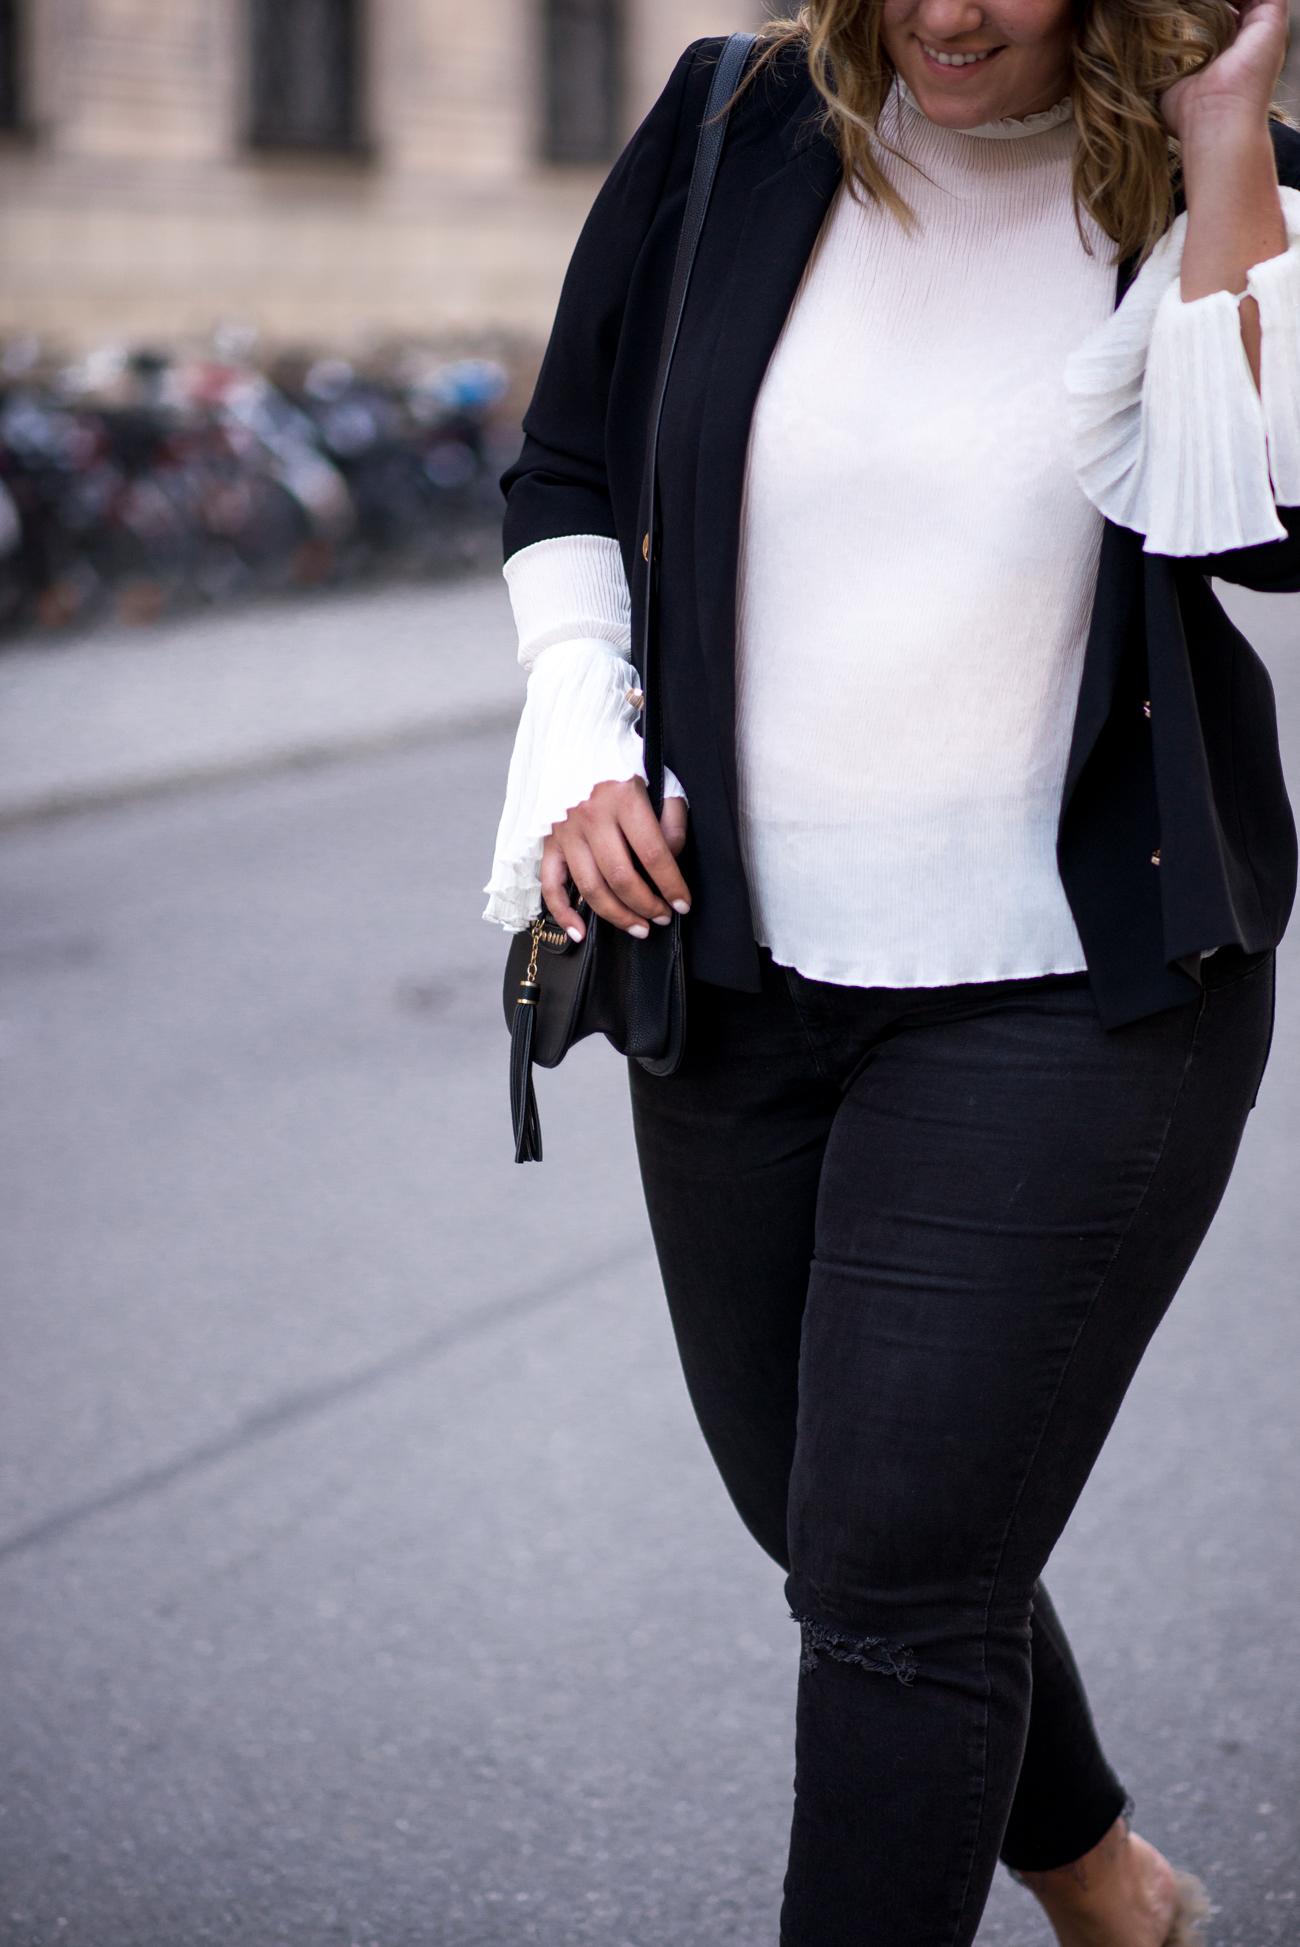 gucci-slipper_gucci-princetown_skinny-and-the-curvy-one_plus_plus-size-blogger_fashion_blogger-deutschland_fashionblogger-munich_curve-11-von-21